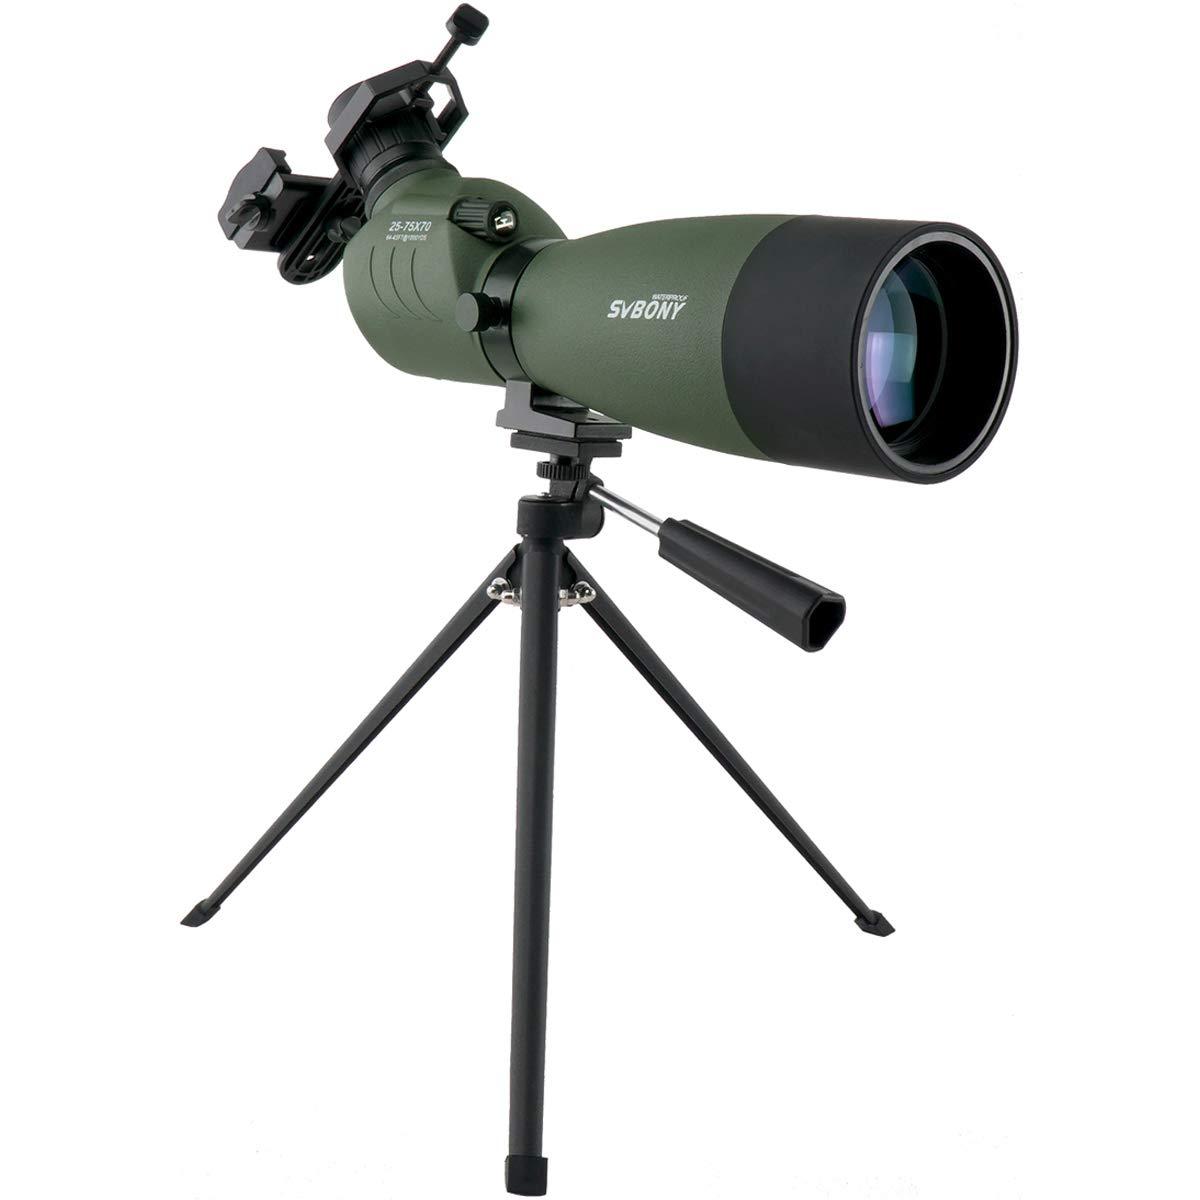 SVBONY SV14 25-75x70mm Spotting Scope with Tripod Bak4 Prism Spotting Scope with Tripod and Phone Adapter for Target Shooting Waterproof FMC Optical Lens by SVBONY